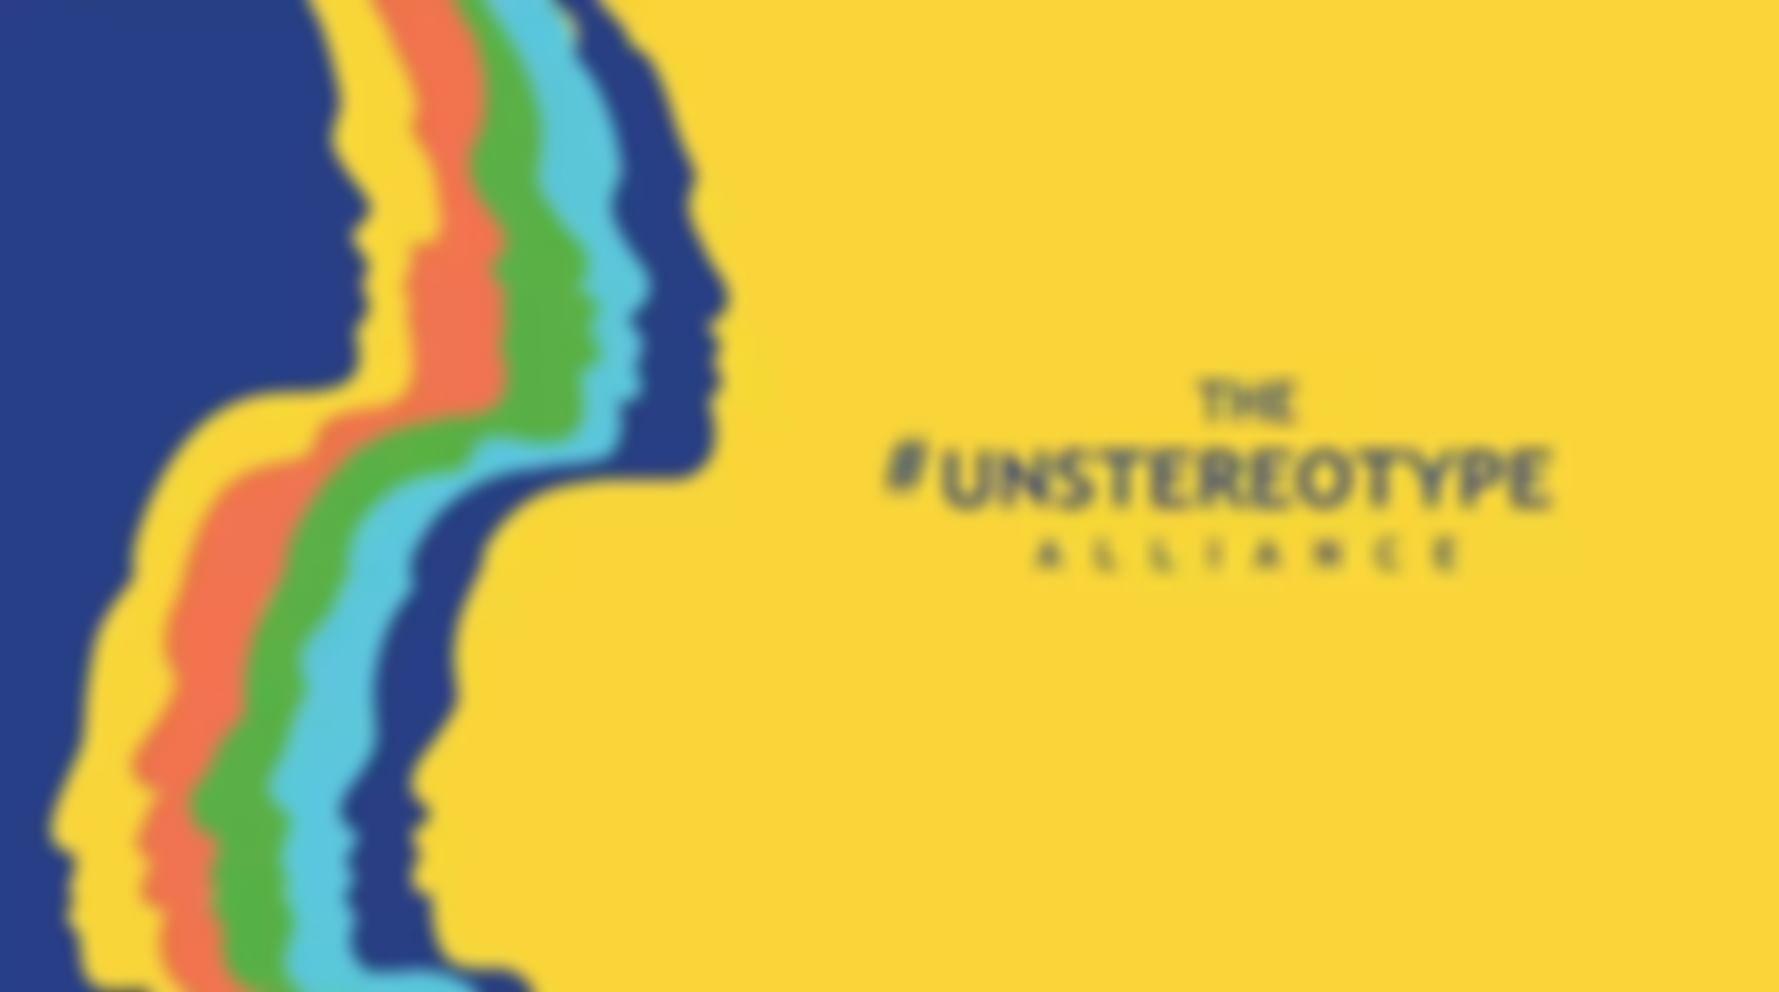 unstereotype